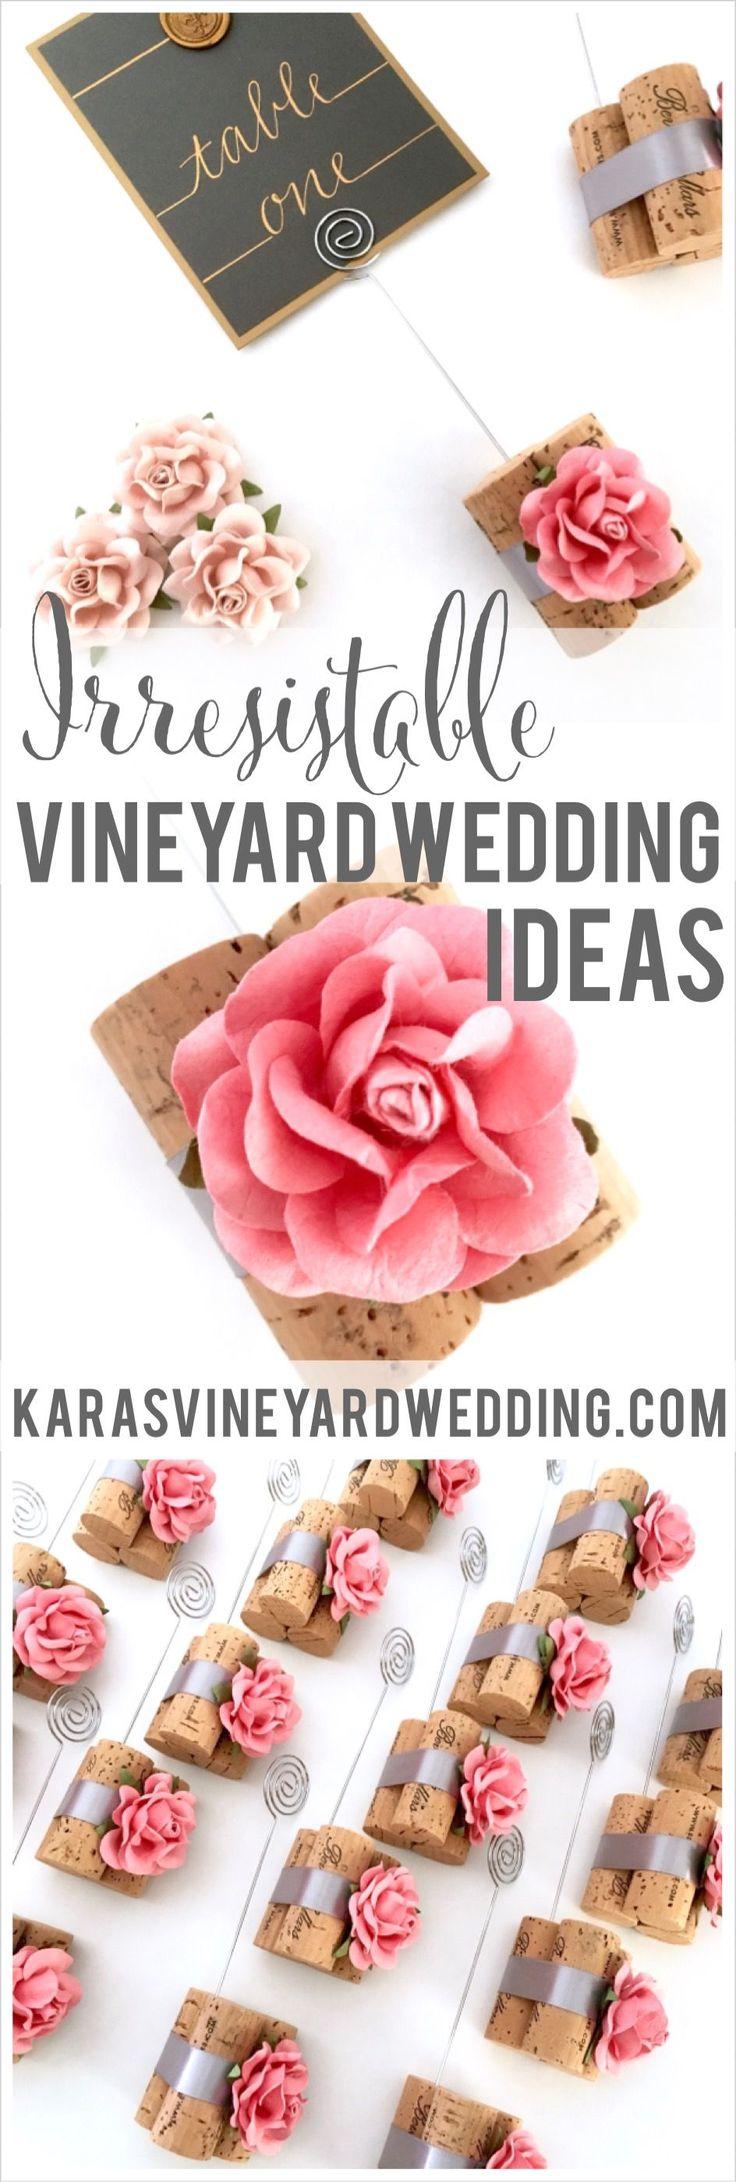 80 best DIY Wedding Favors images on Pinterest | Wedding ideas ...